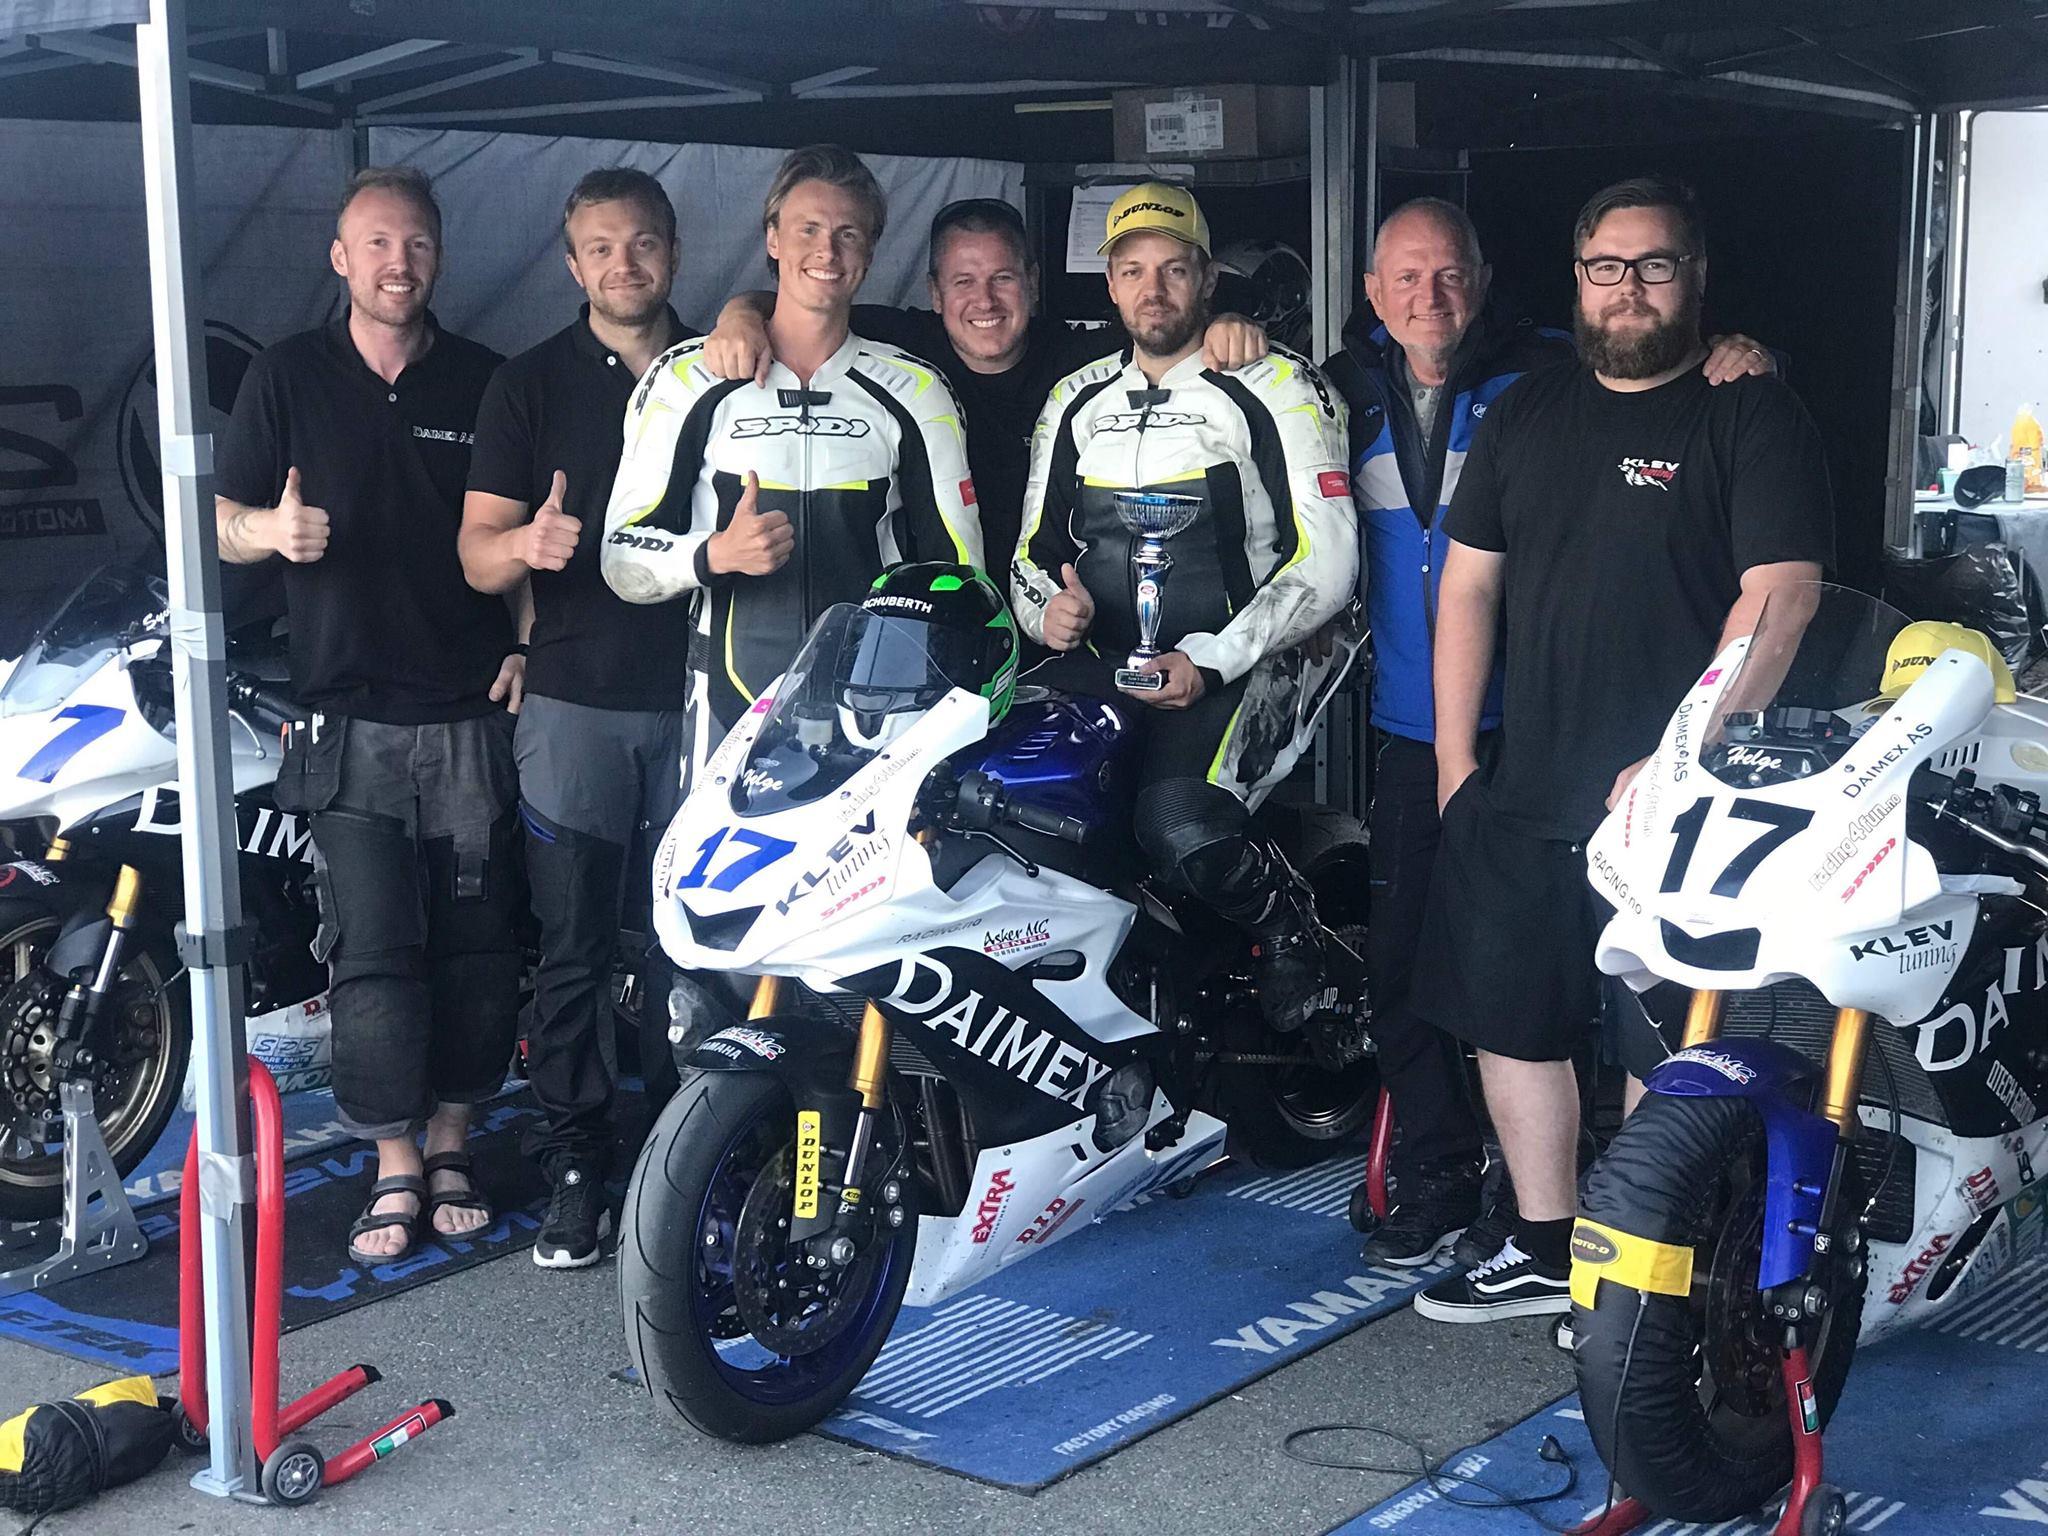 Team Daimex 2018